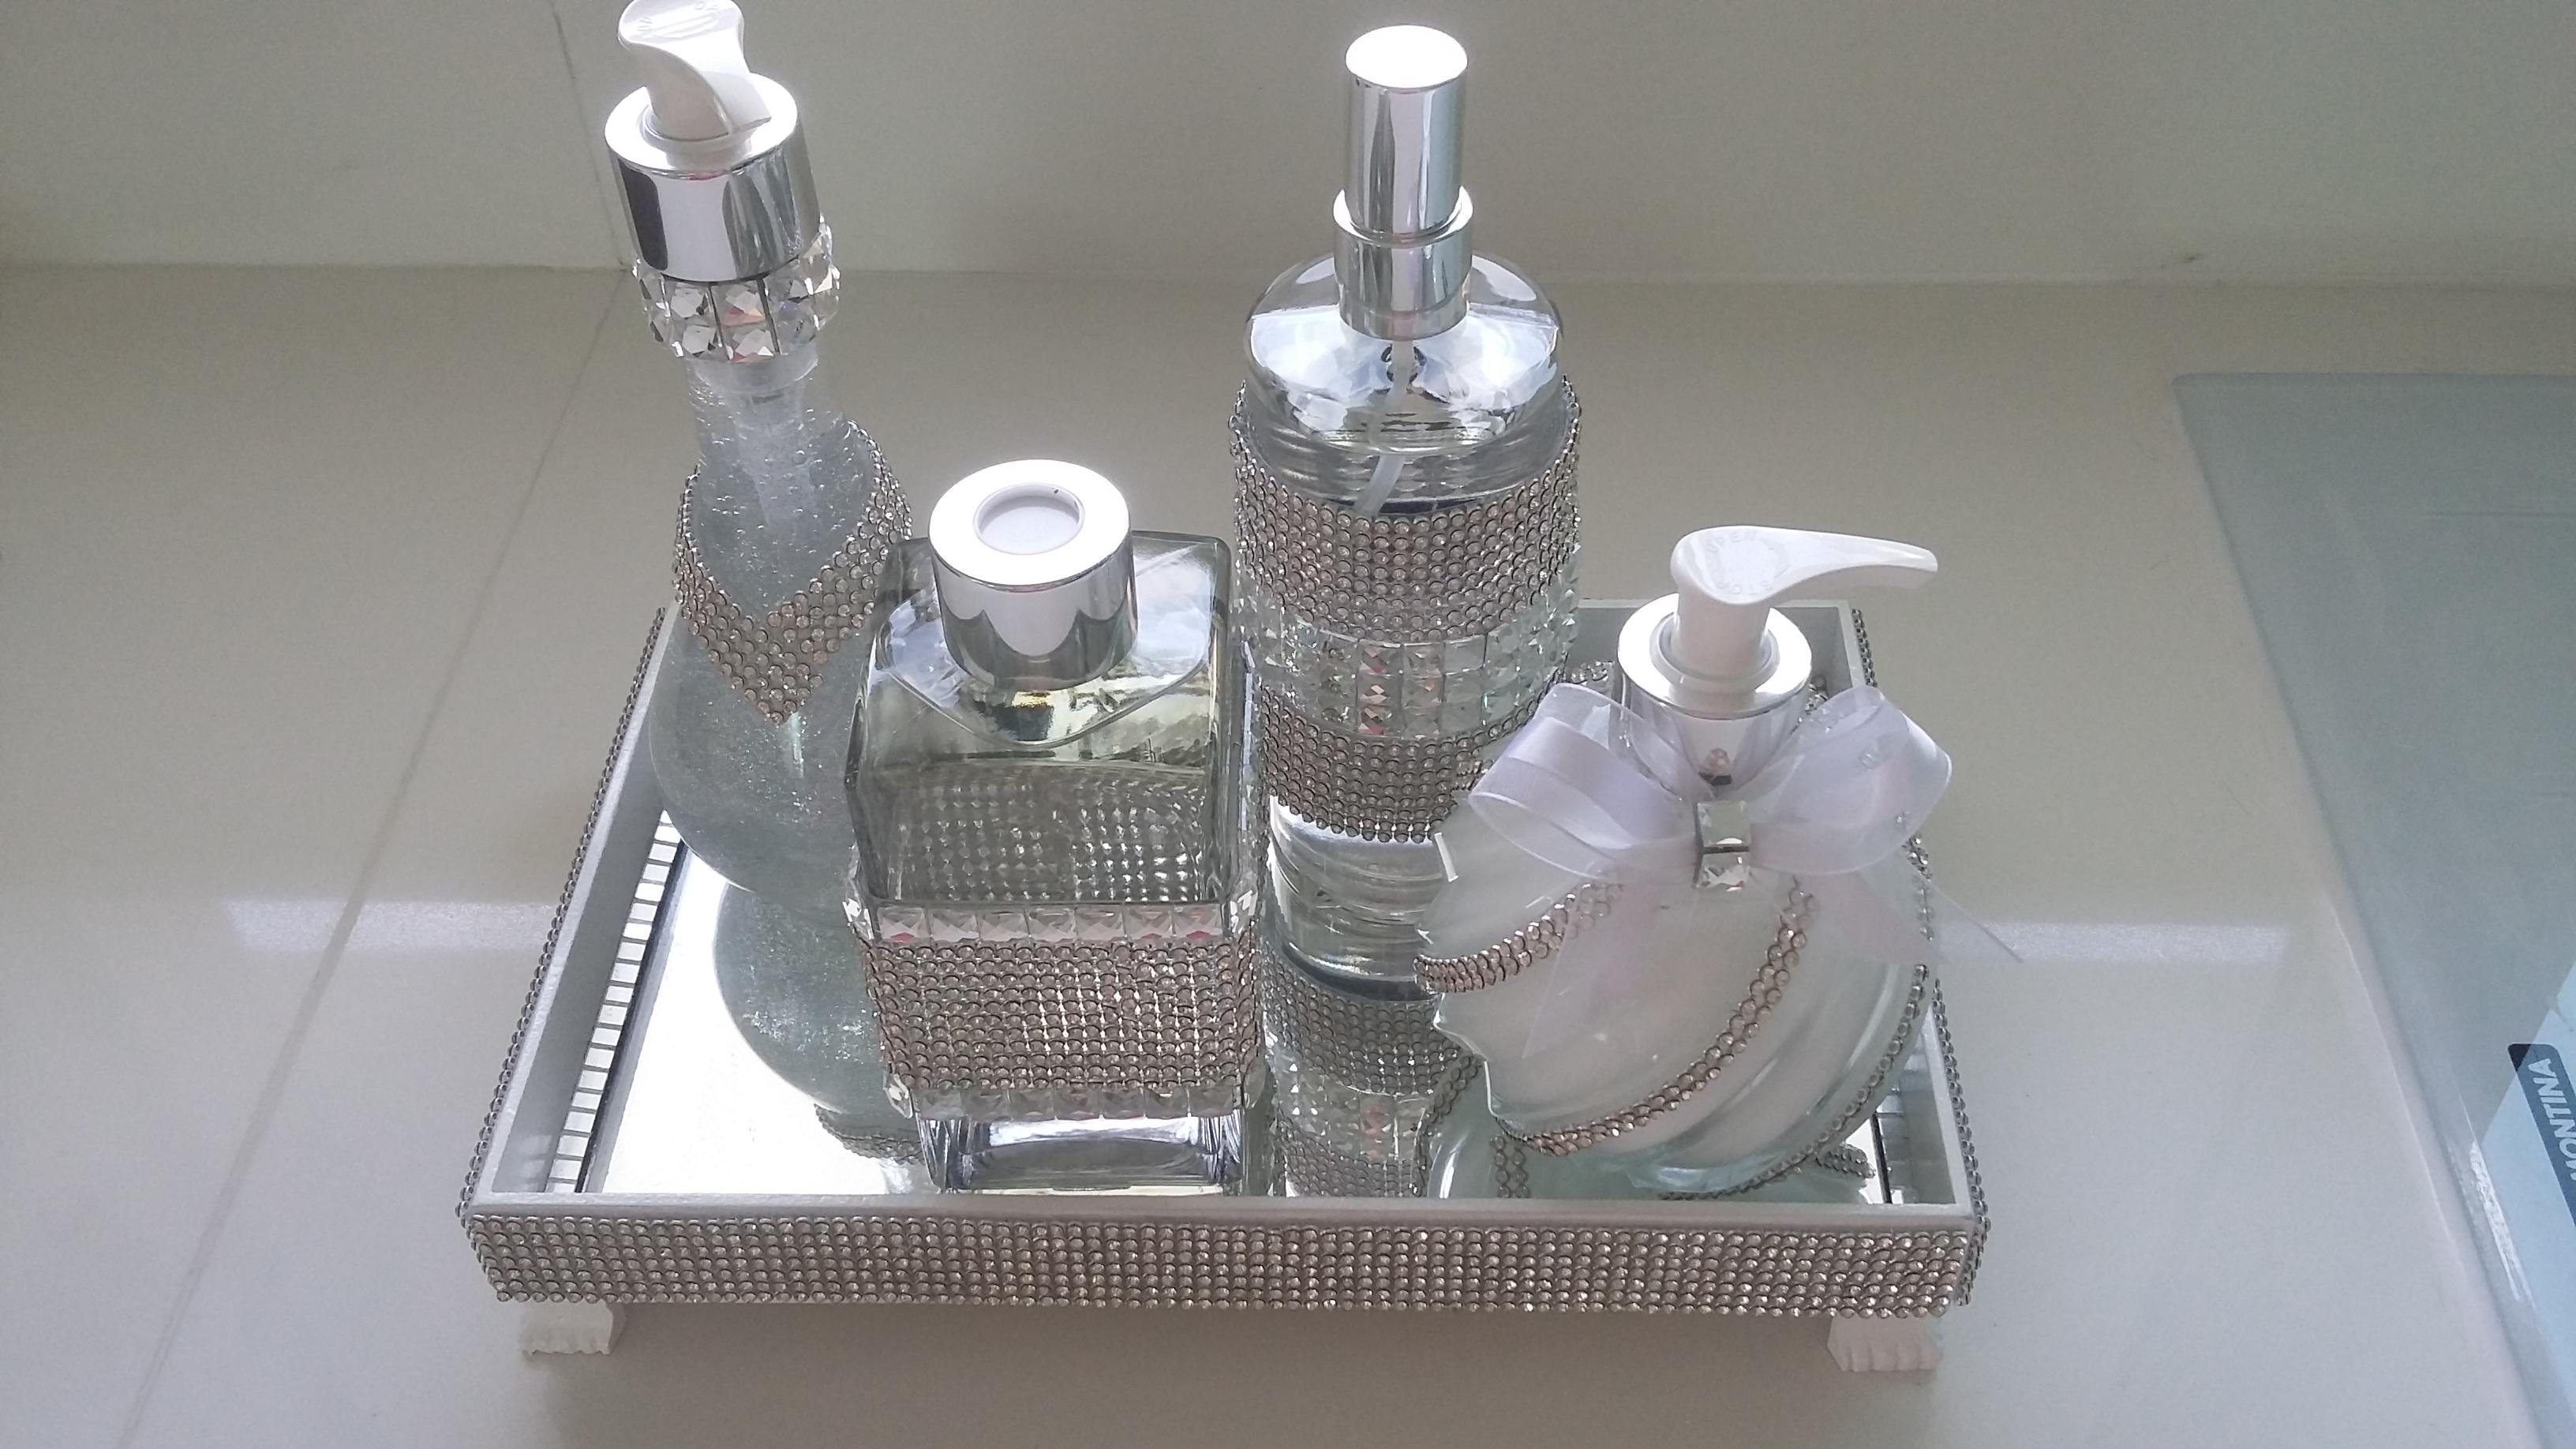 kit para banheiro lavabo bandeja espelho kit para banheiro lavabo body  #576374 3264 1836